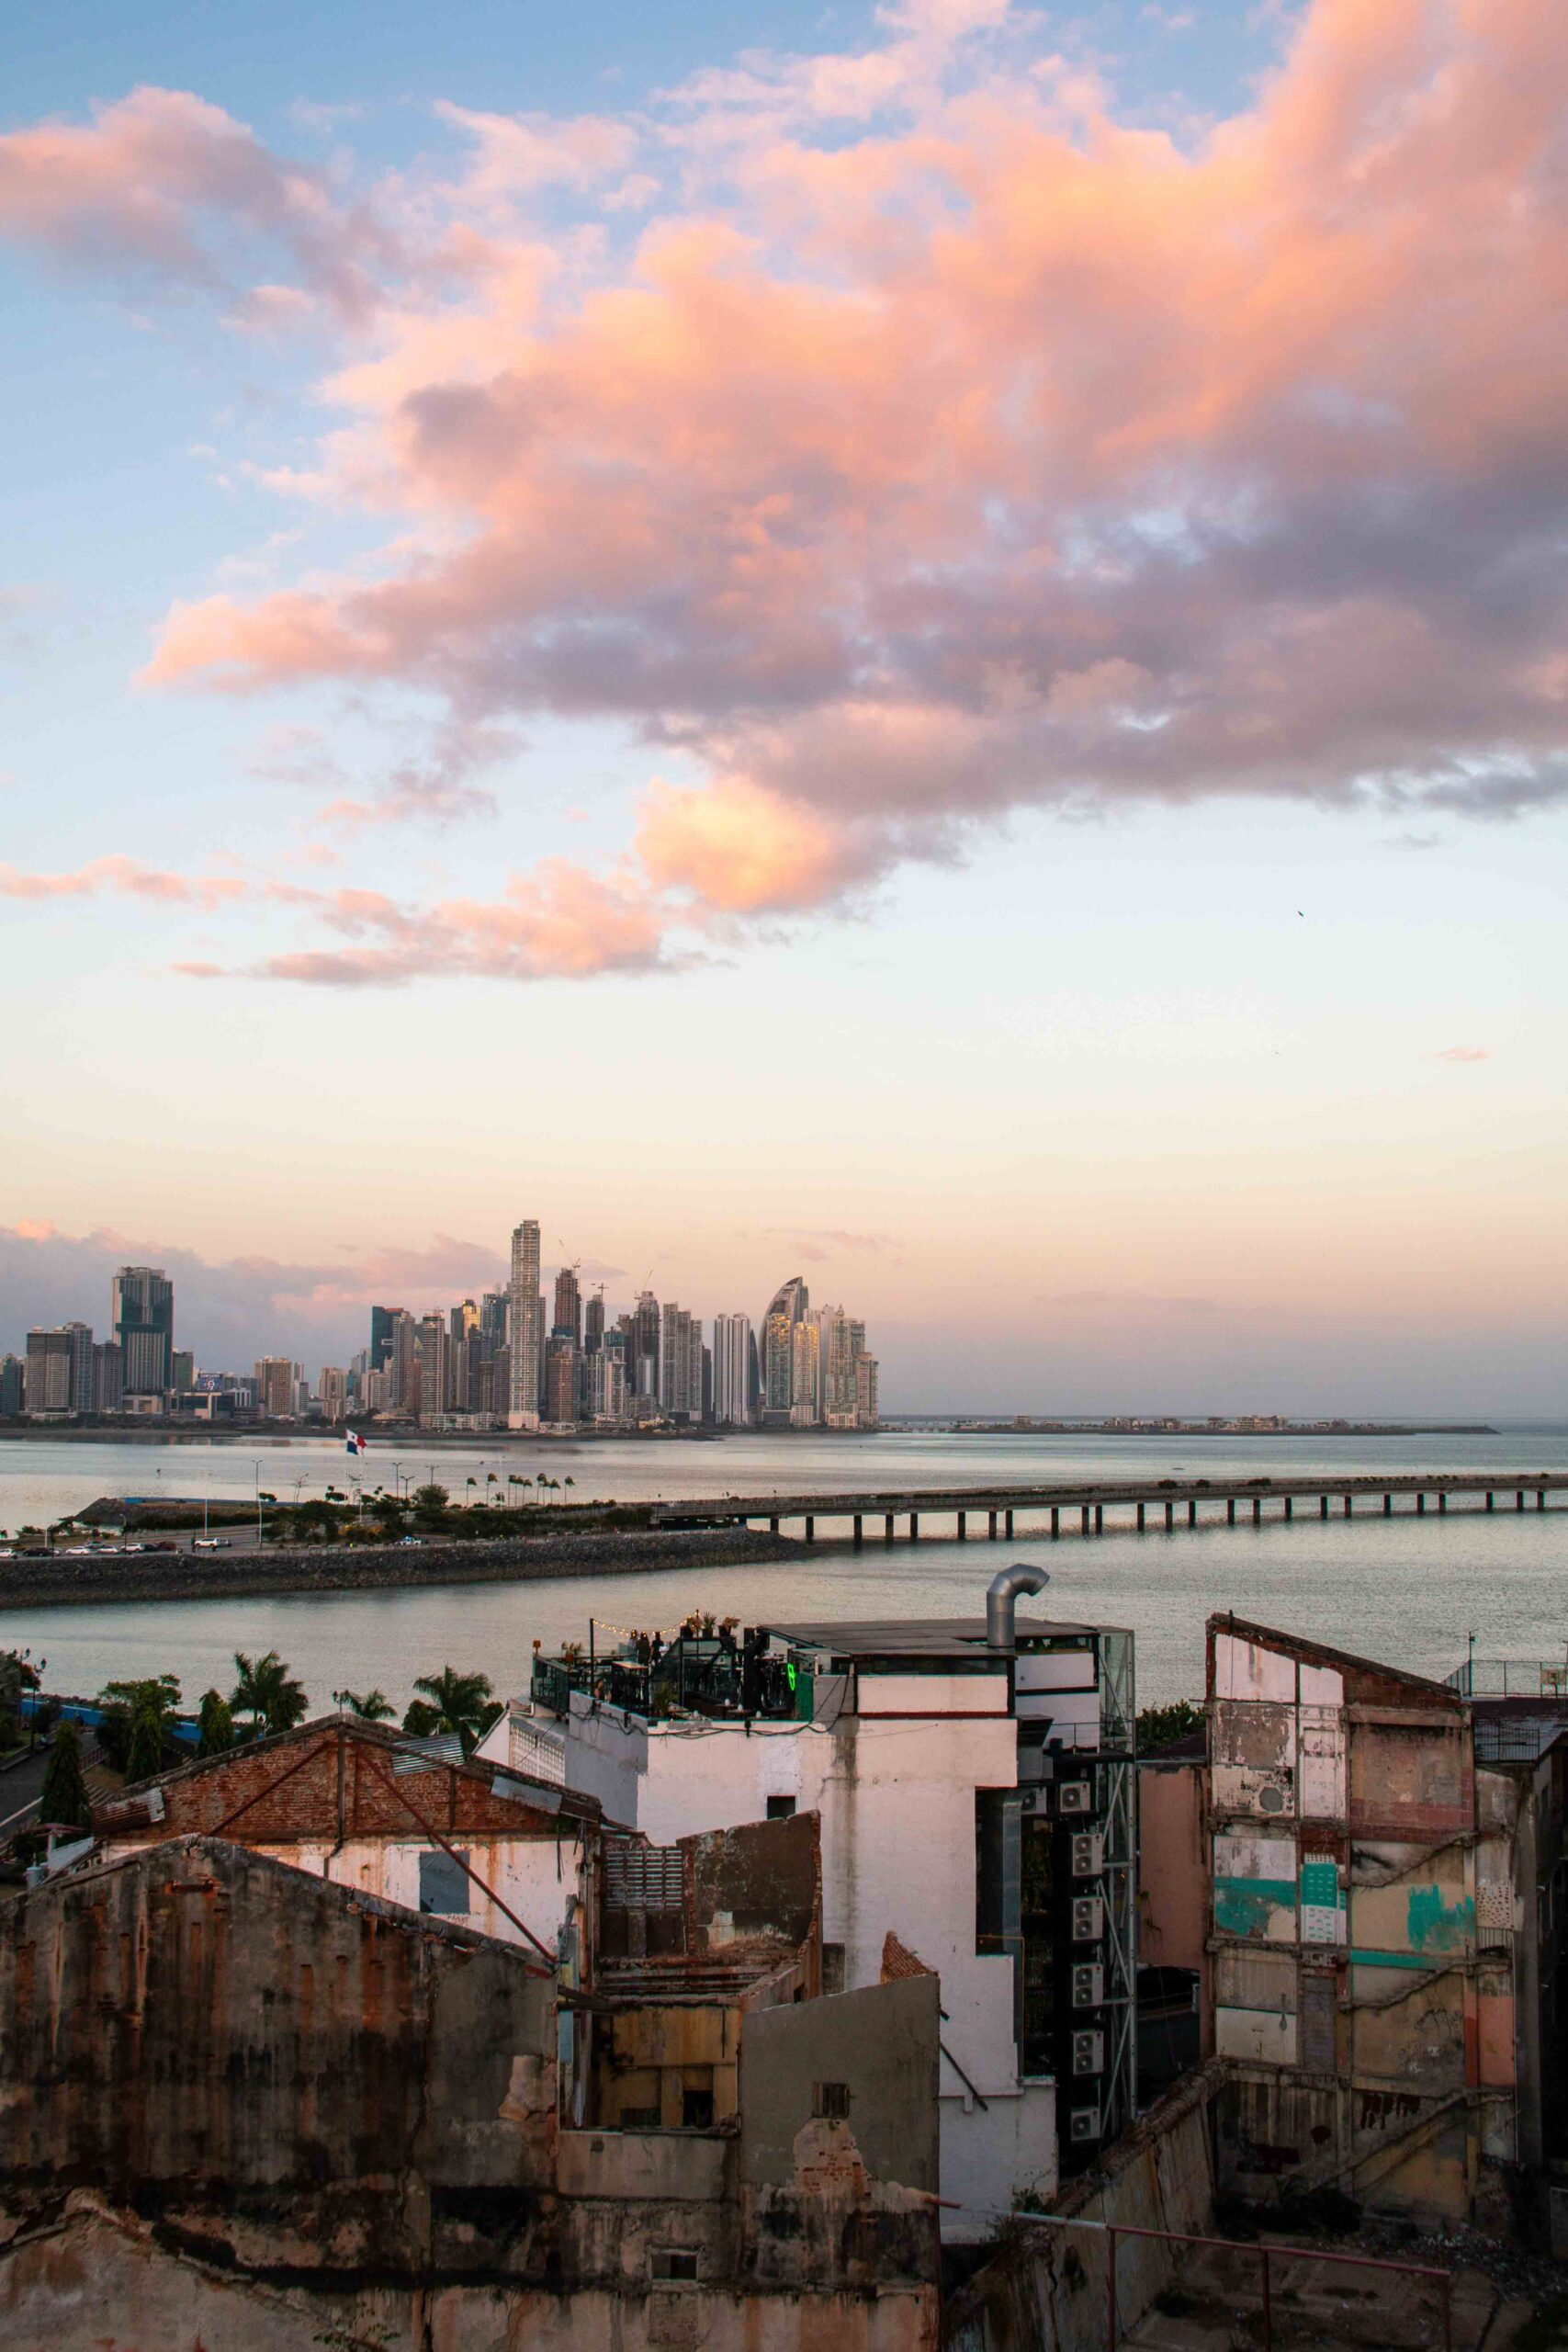 Sunset rooftop view Panama City